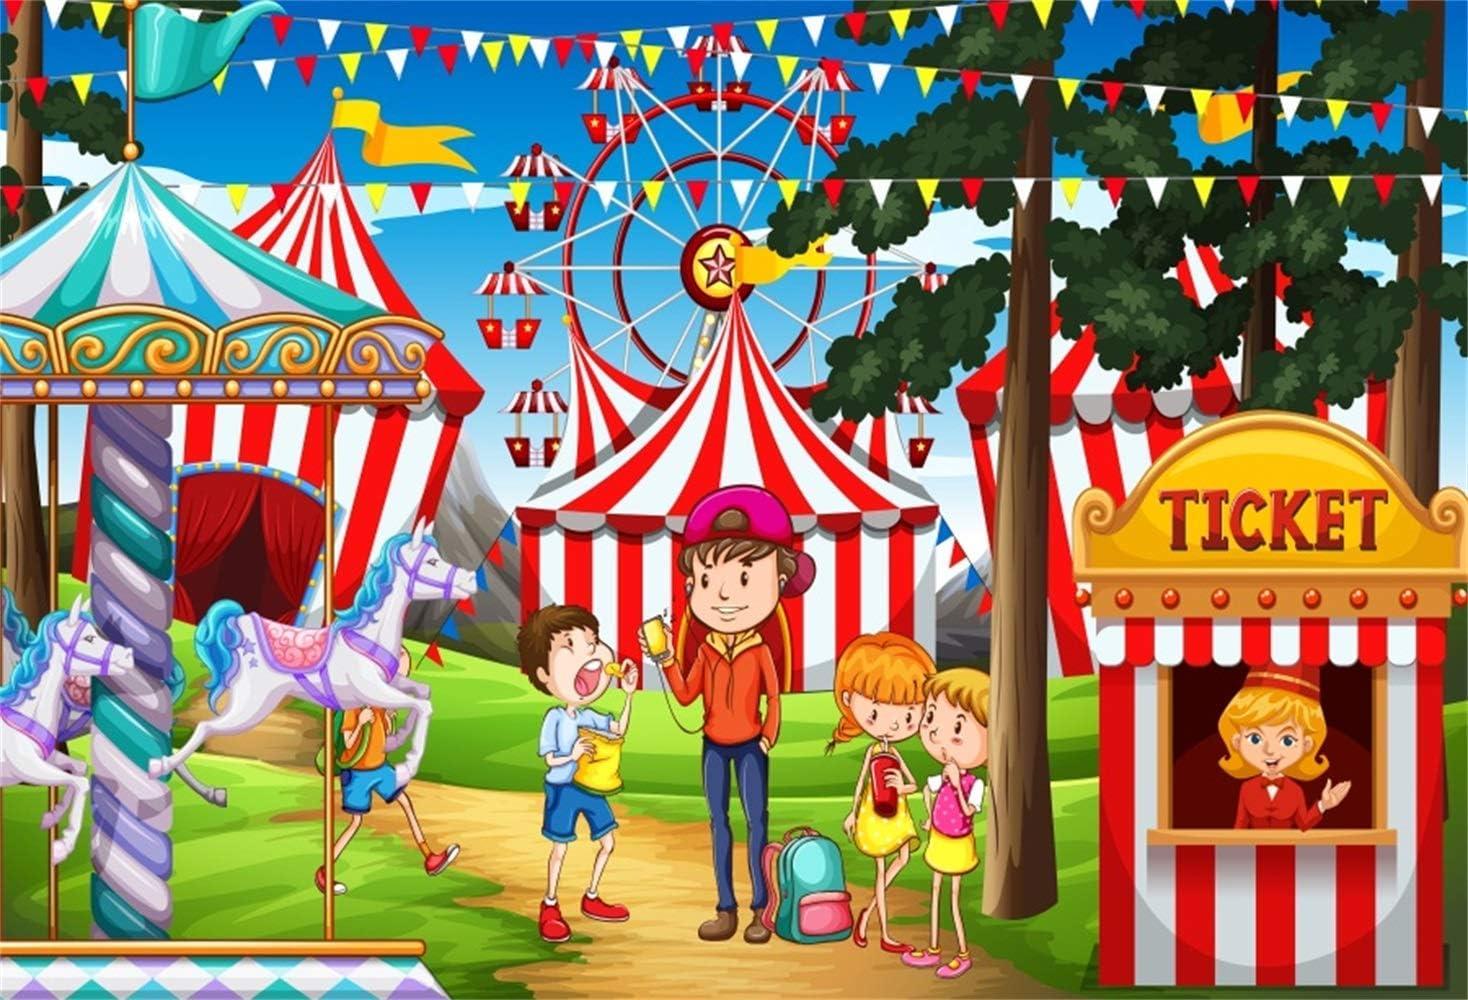 GoEoo Cartoon Circus Ticket Office Backdrop 10x7ft Vinyl Lingering Children Vistors Whirligig Ferris Wheels Photography Background Kids Baby Portrait Shoot Birthday Party Banner Cake Smash